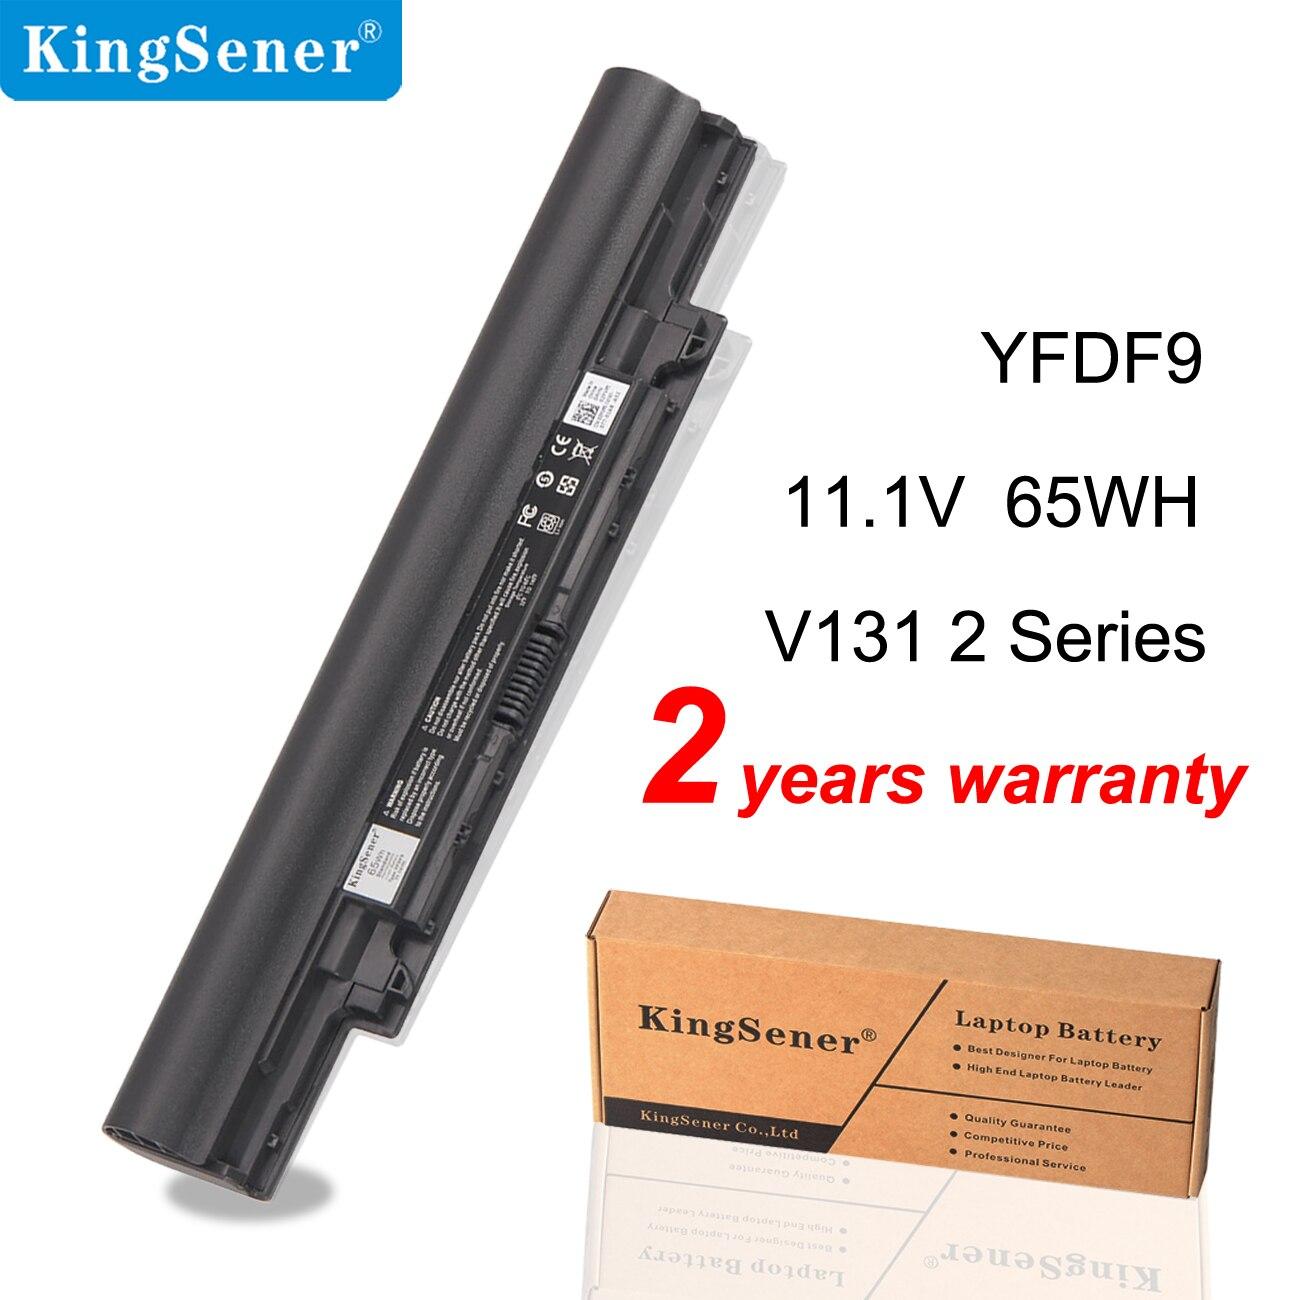 KingSener YFDF9 Latitude YFOF9